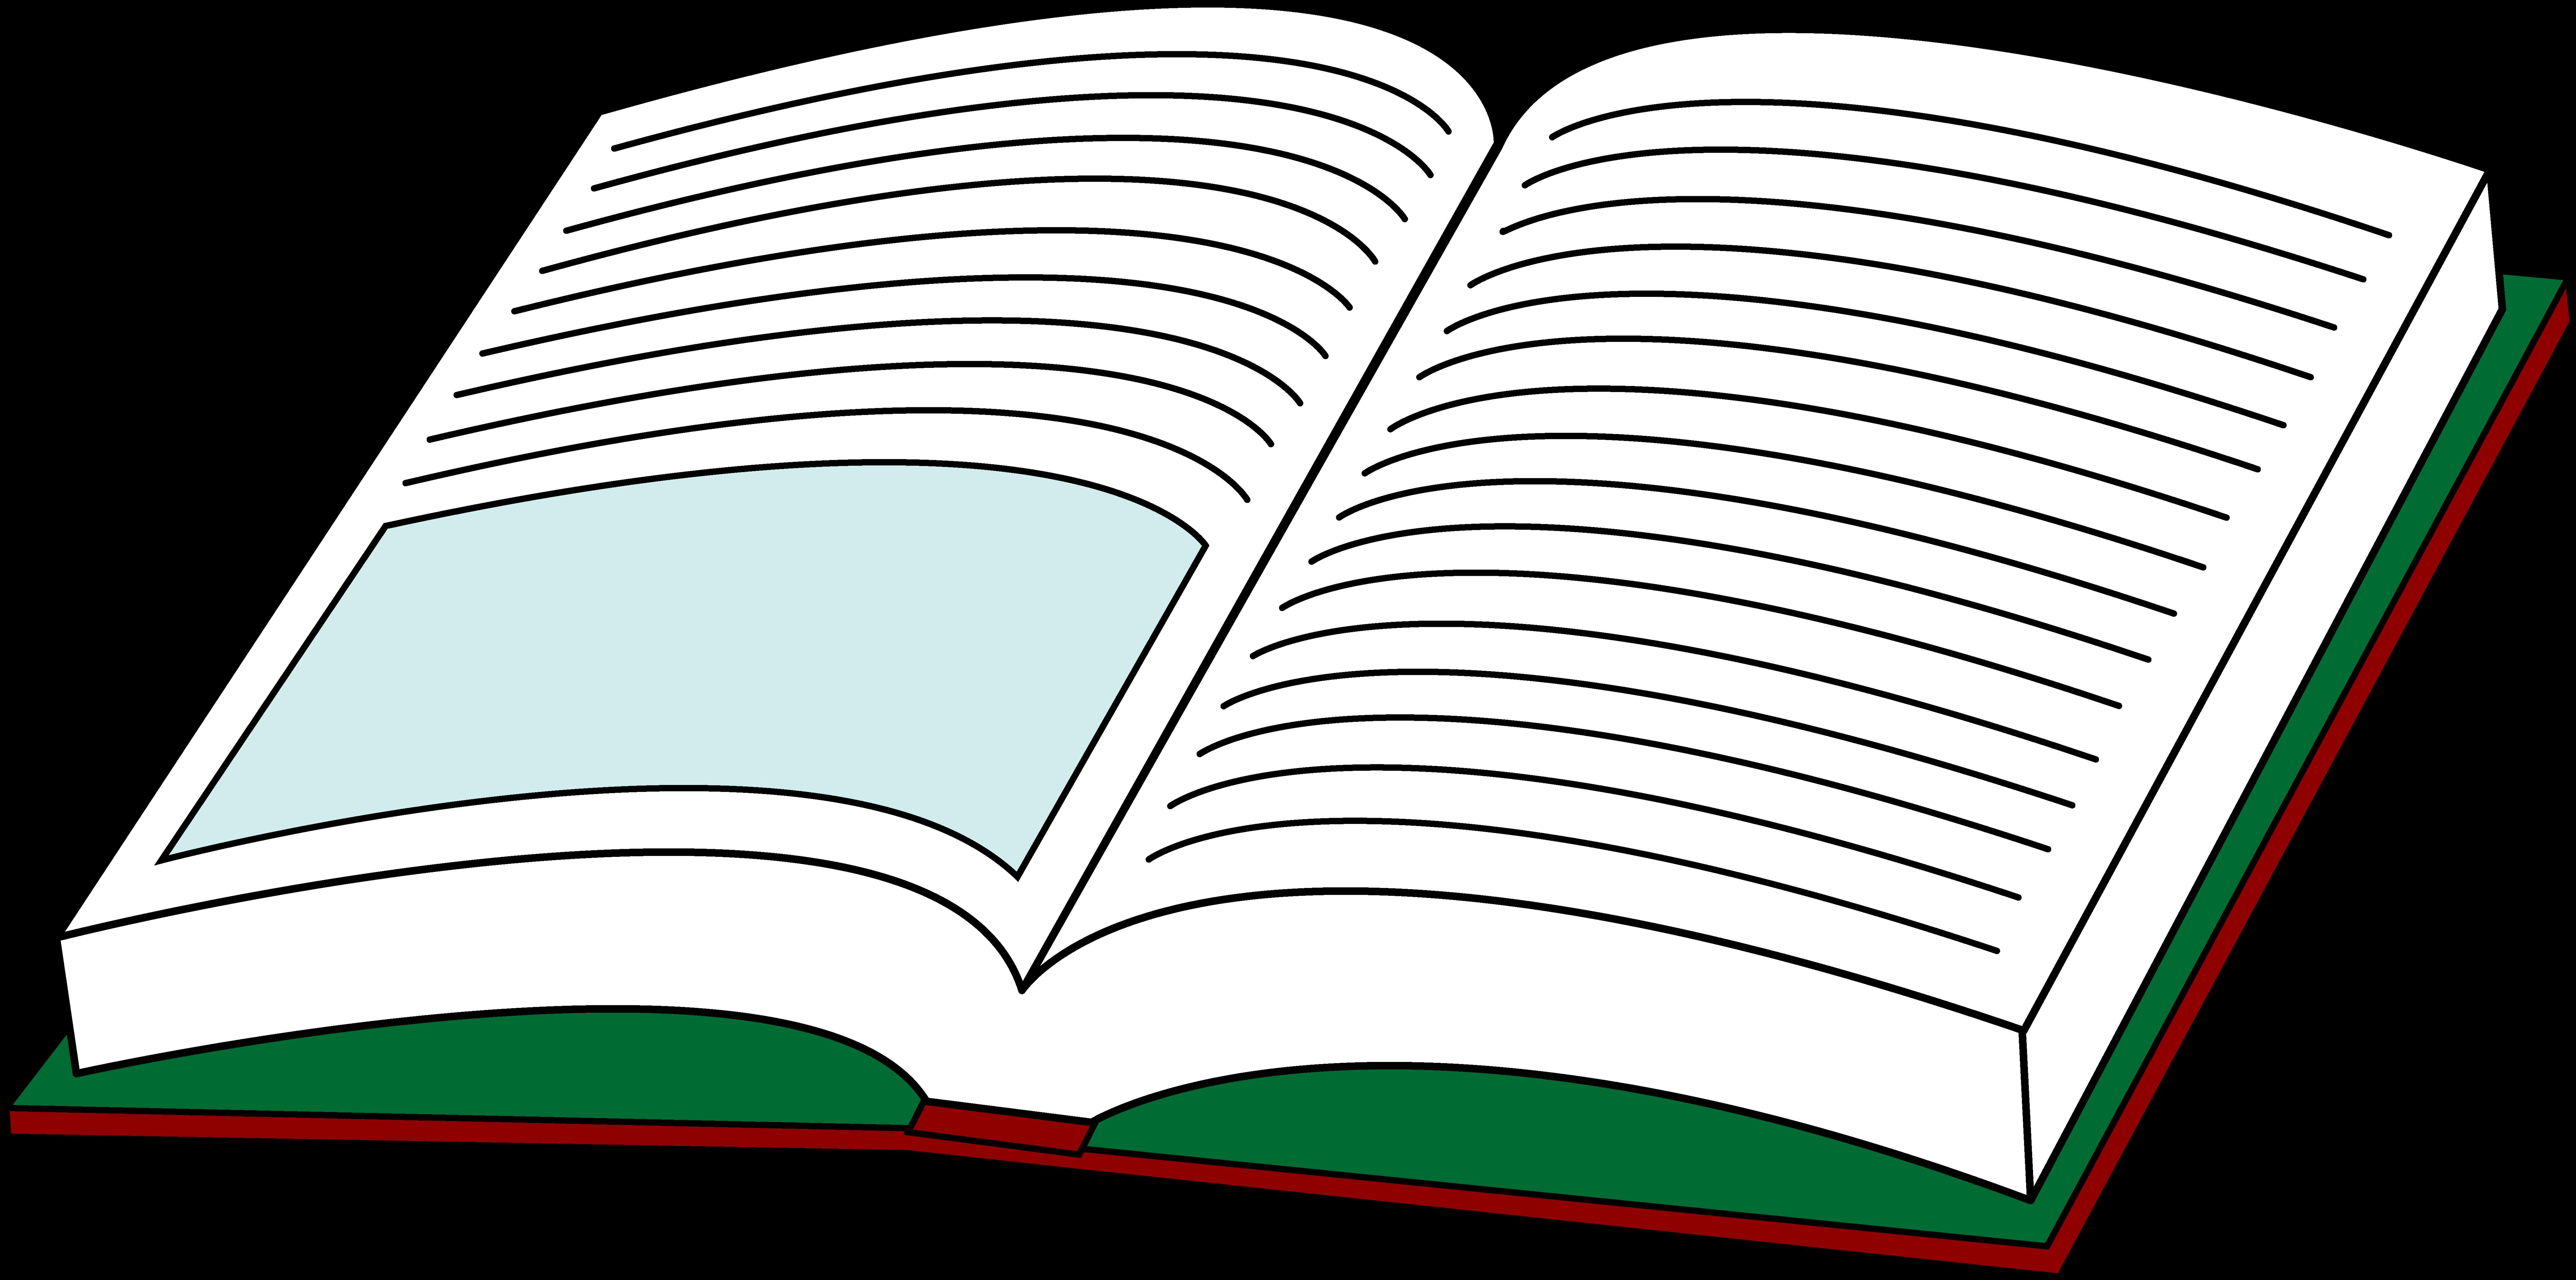 8104x4026 Book Clipart Open Book